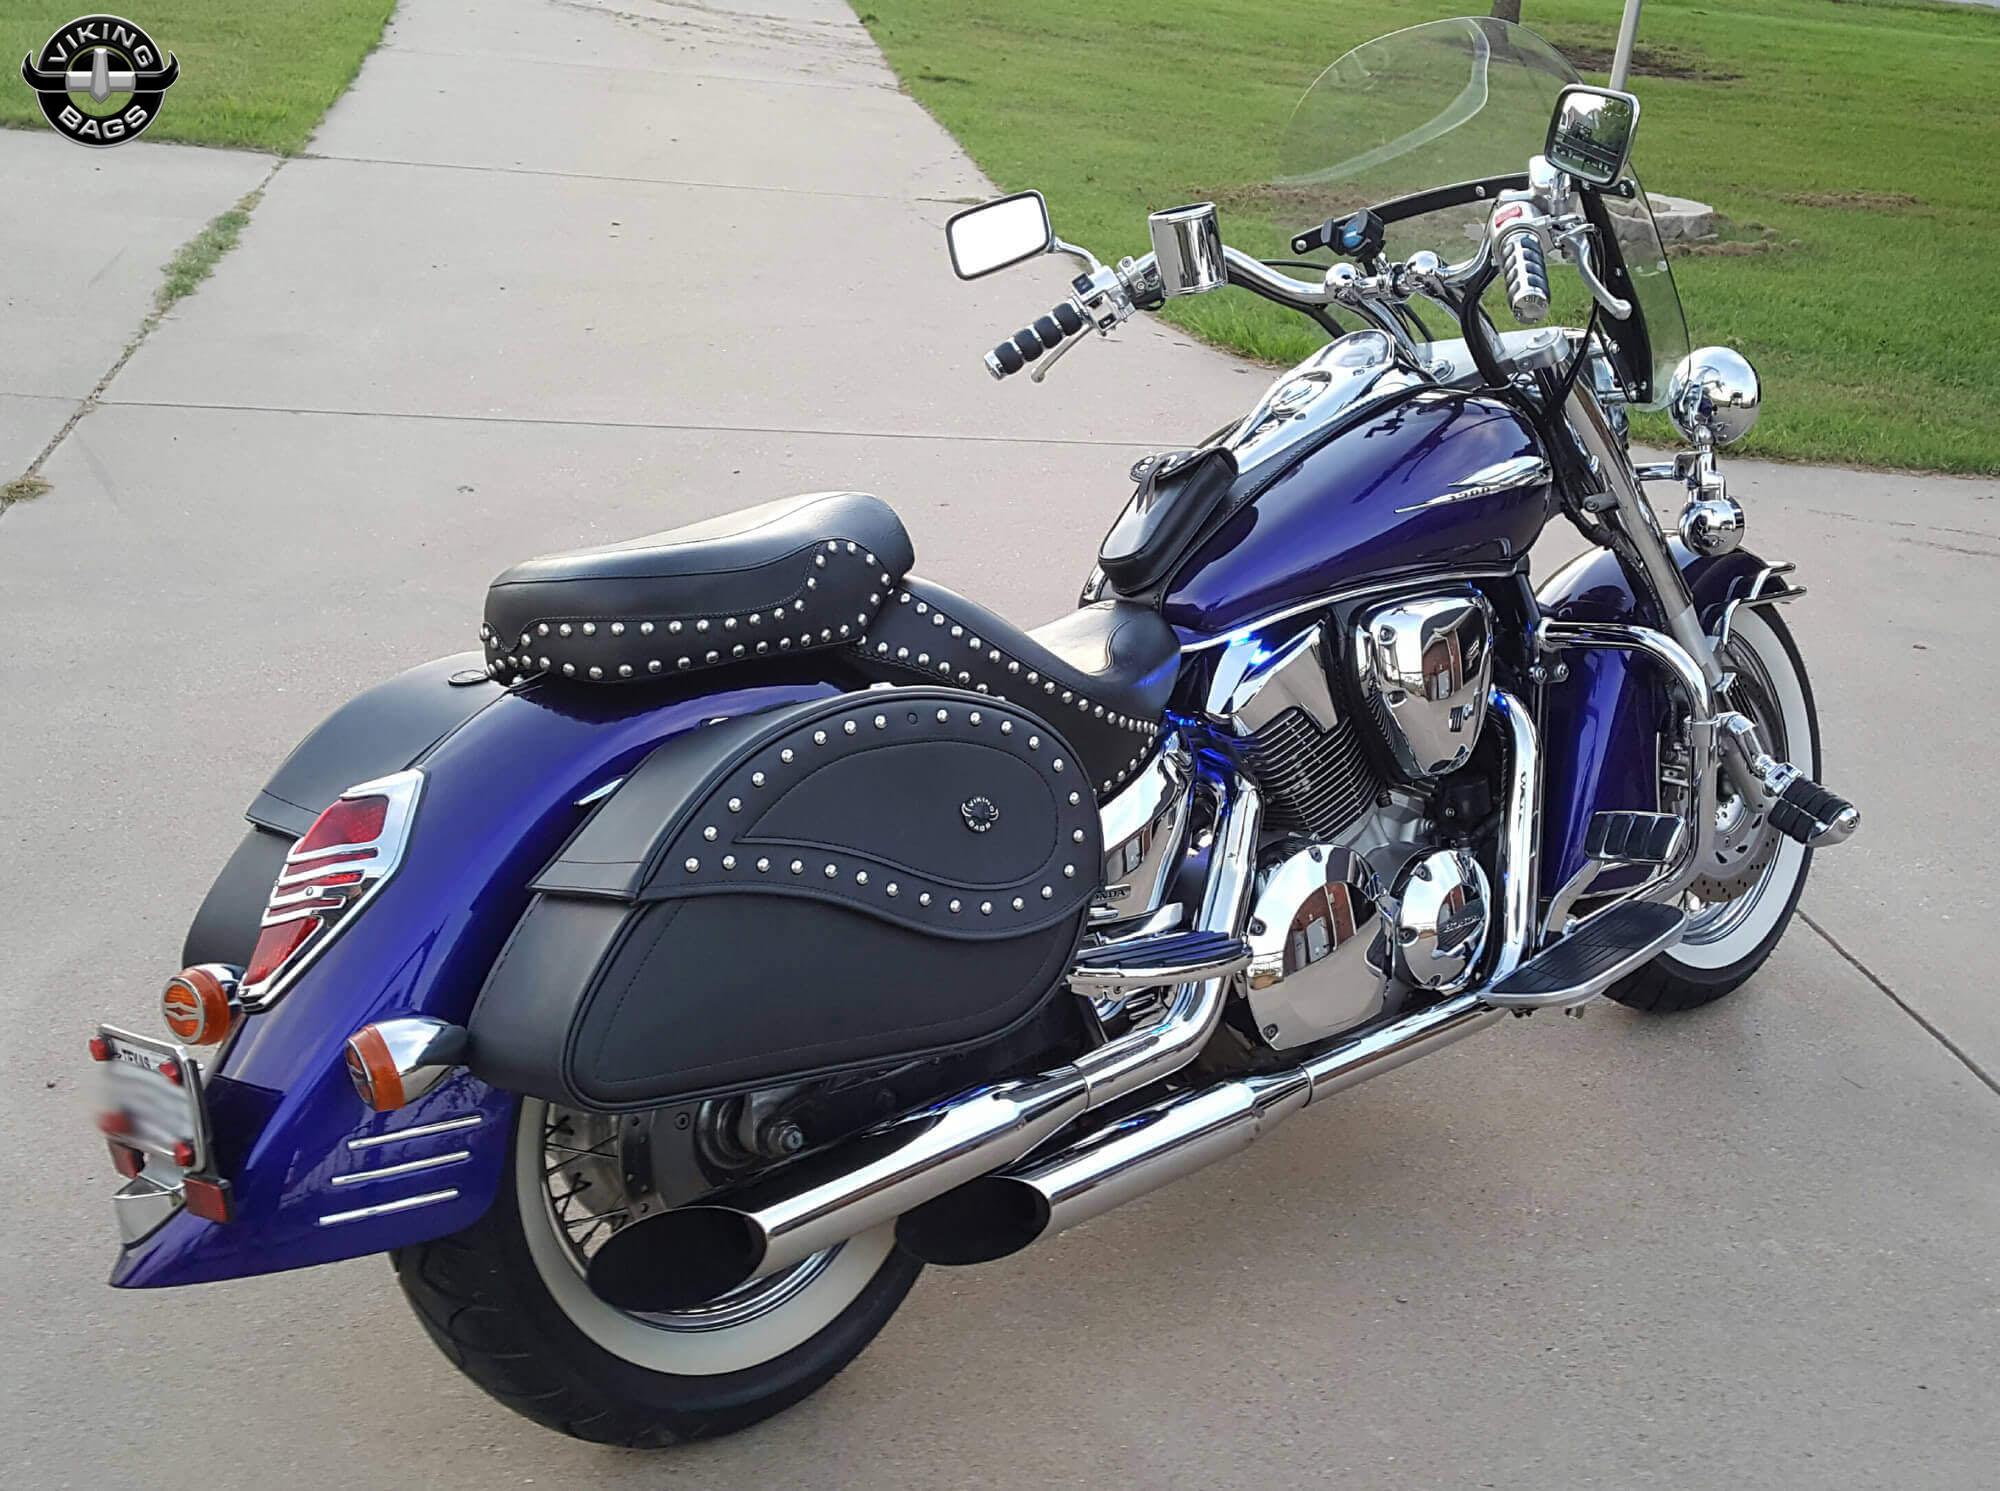 michael s 03 honda vtx 1300 w ultimate shape studded saddlebags [ 2000 x 1491 Pixel ]